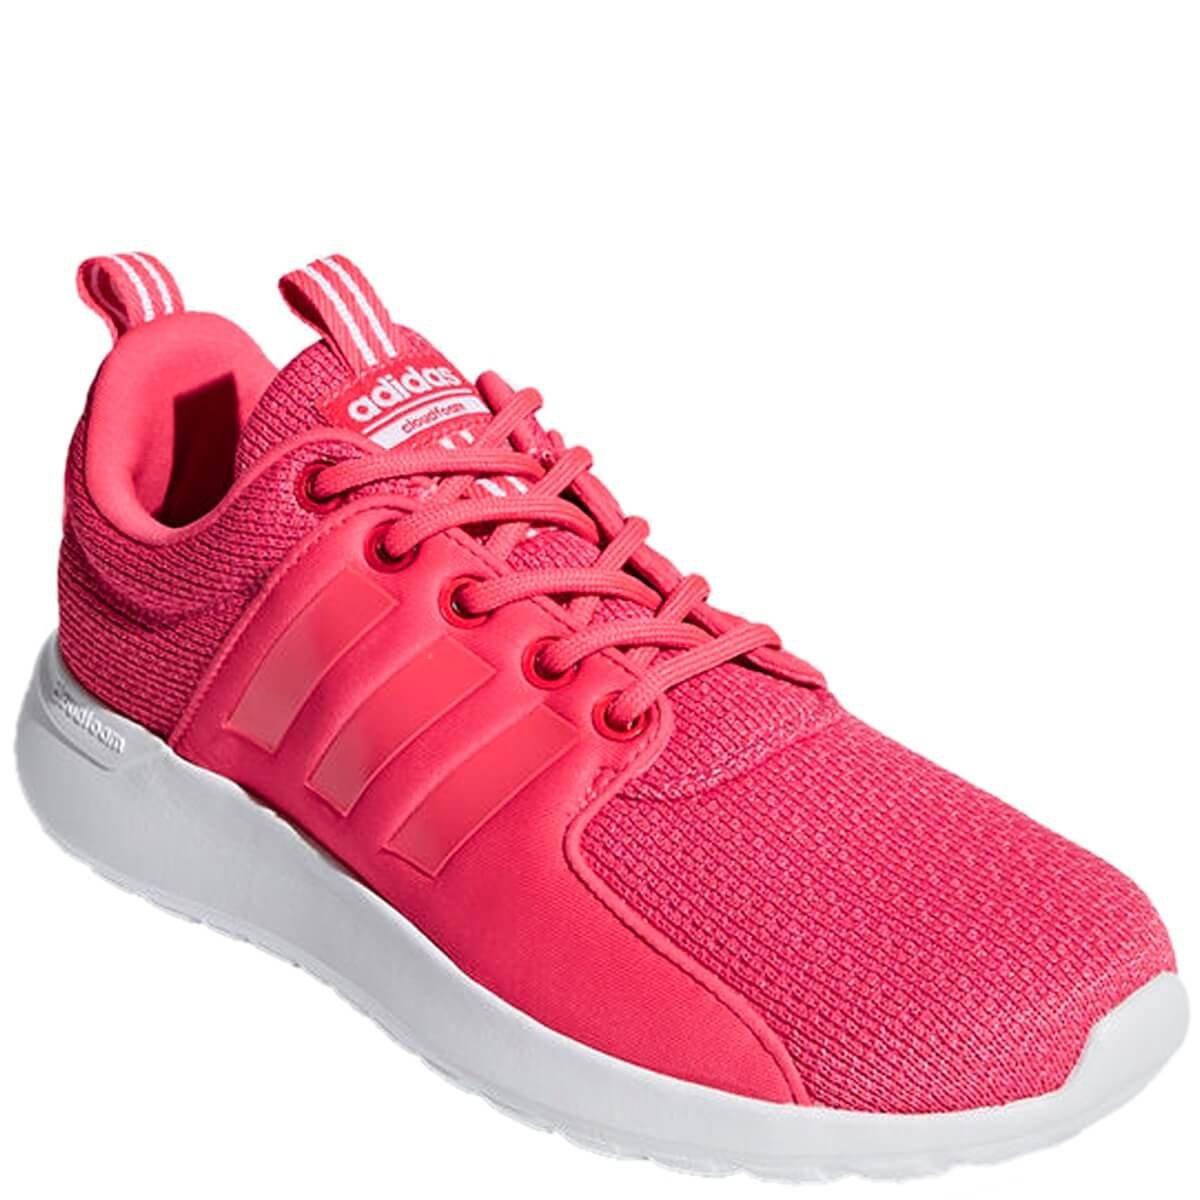 Bizz Store - Tênis Feminino Adidas Cloudfoam Lite Racer 180174c65428a